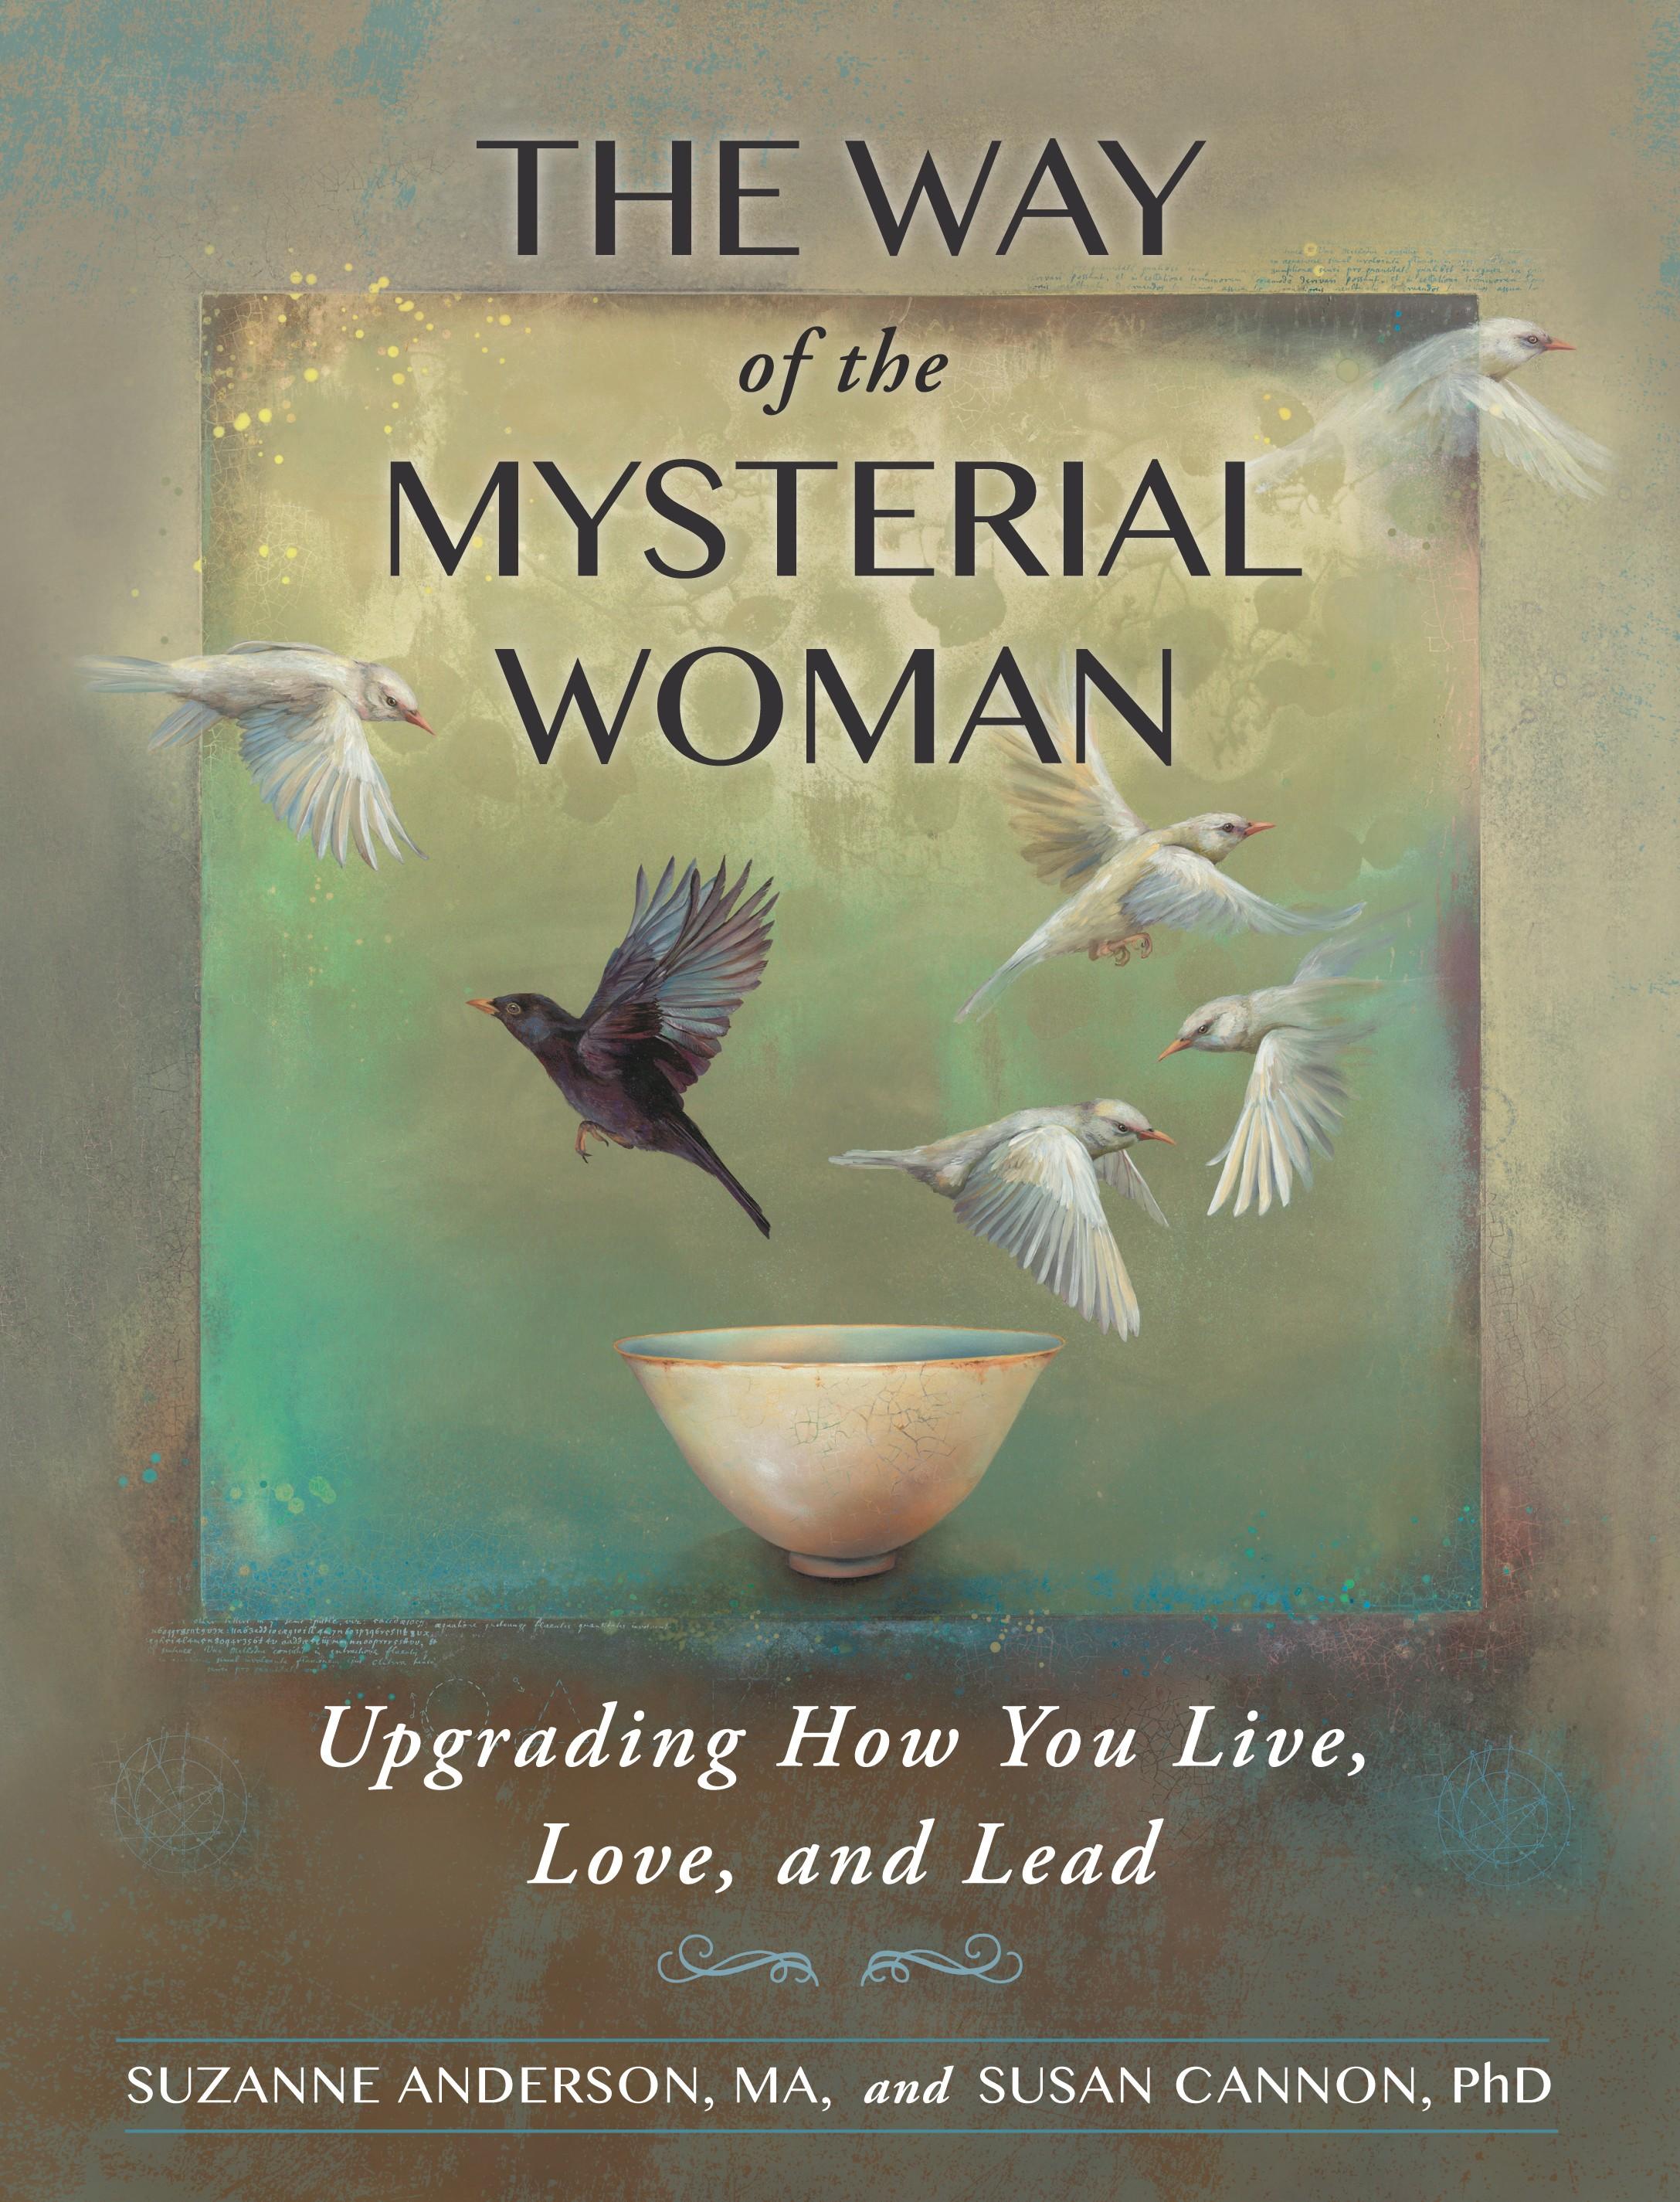 MysterialWoman-choice.indd